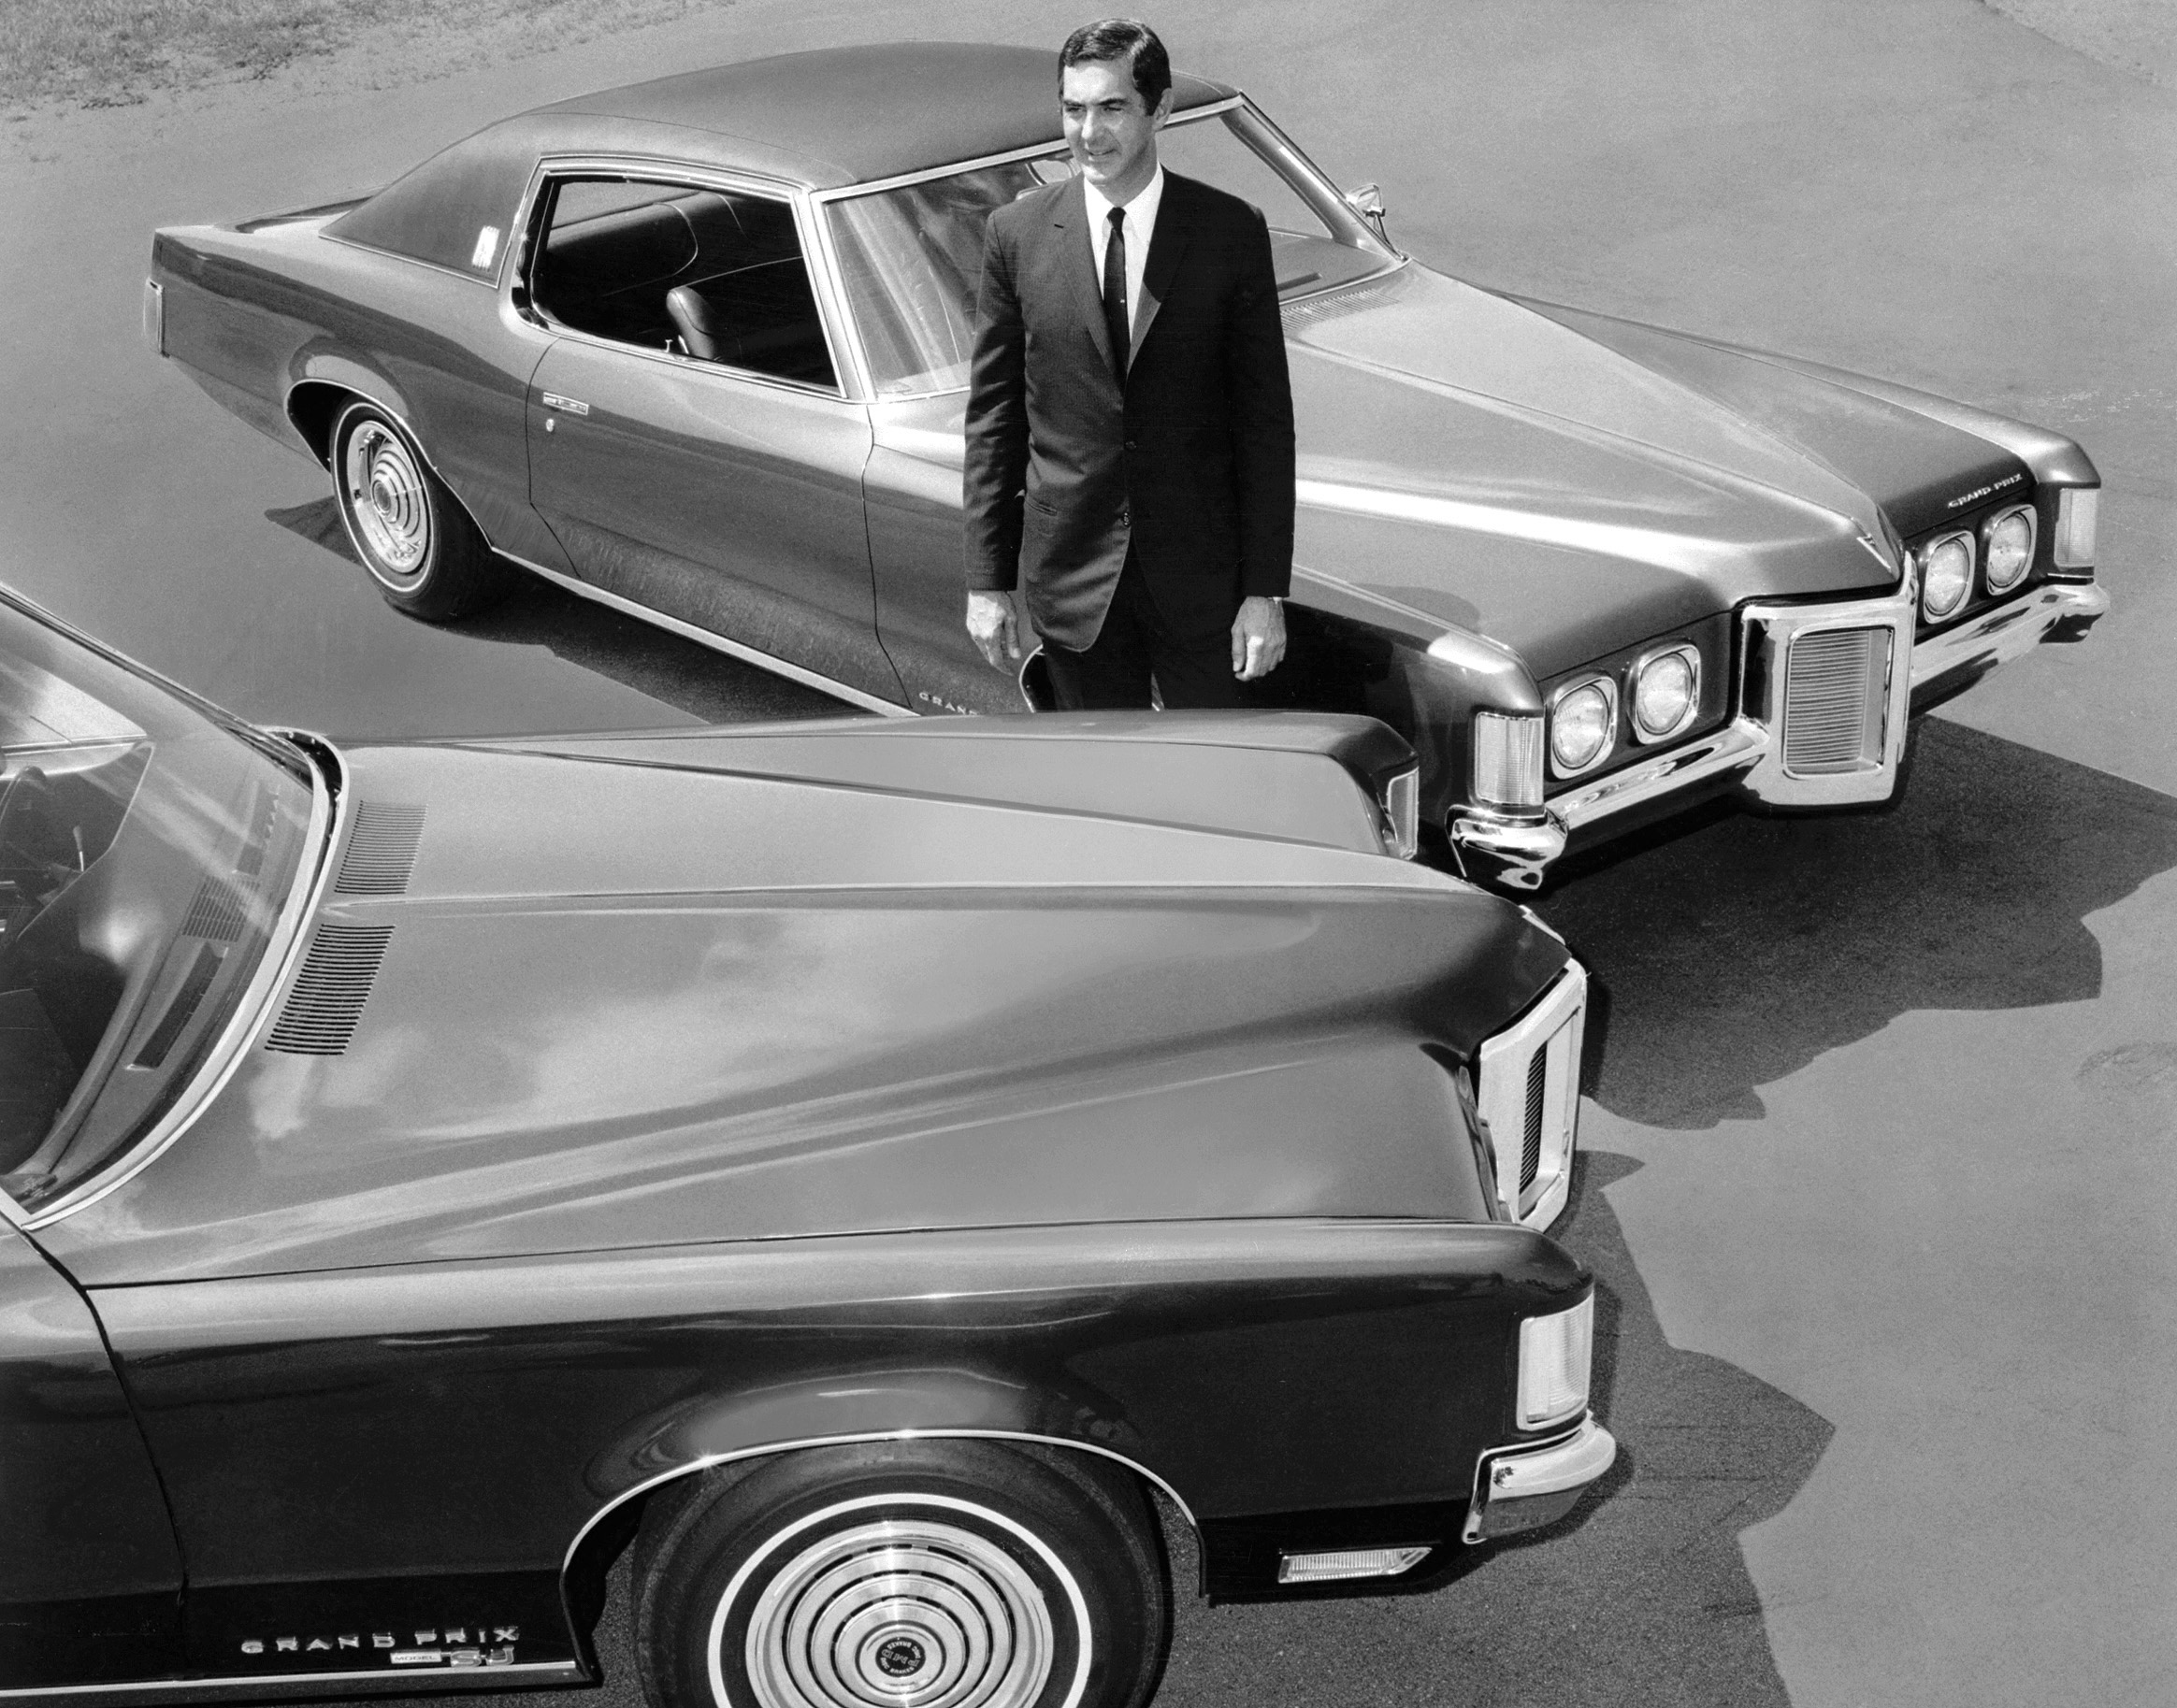 1969 pontiac grand prix delorean